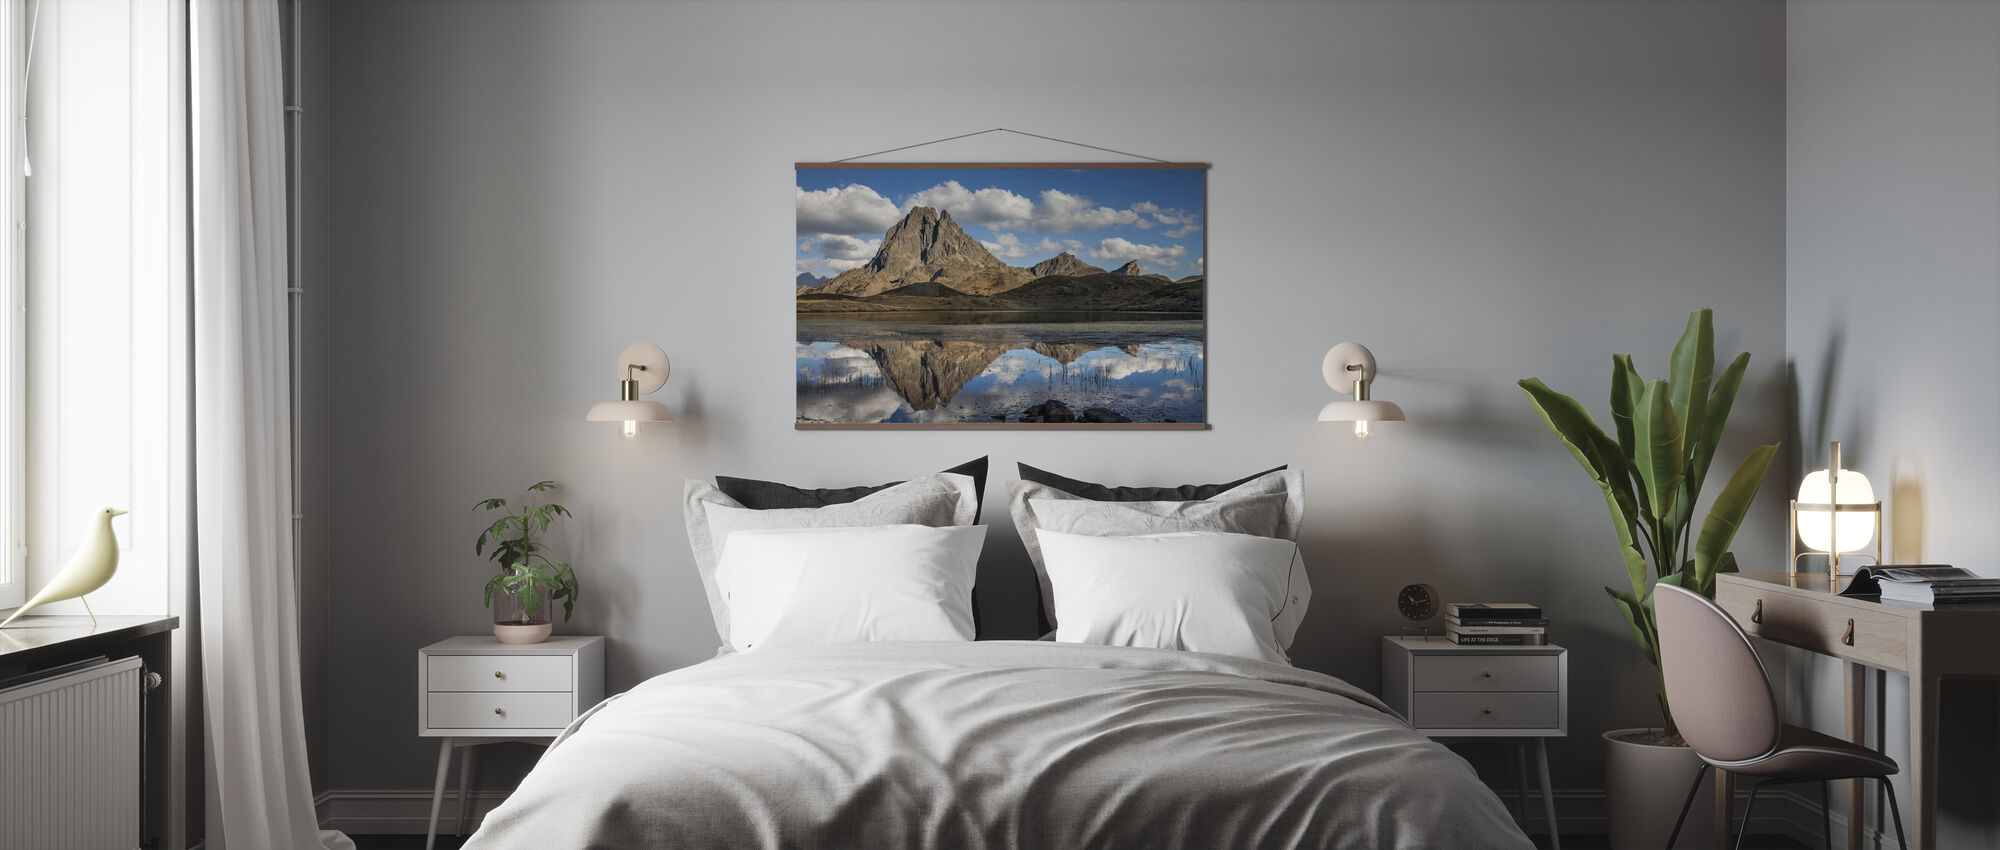 Midi D'Ossau XXIV - Poster - Bedroom